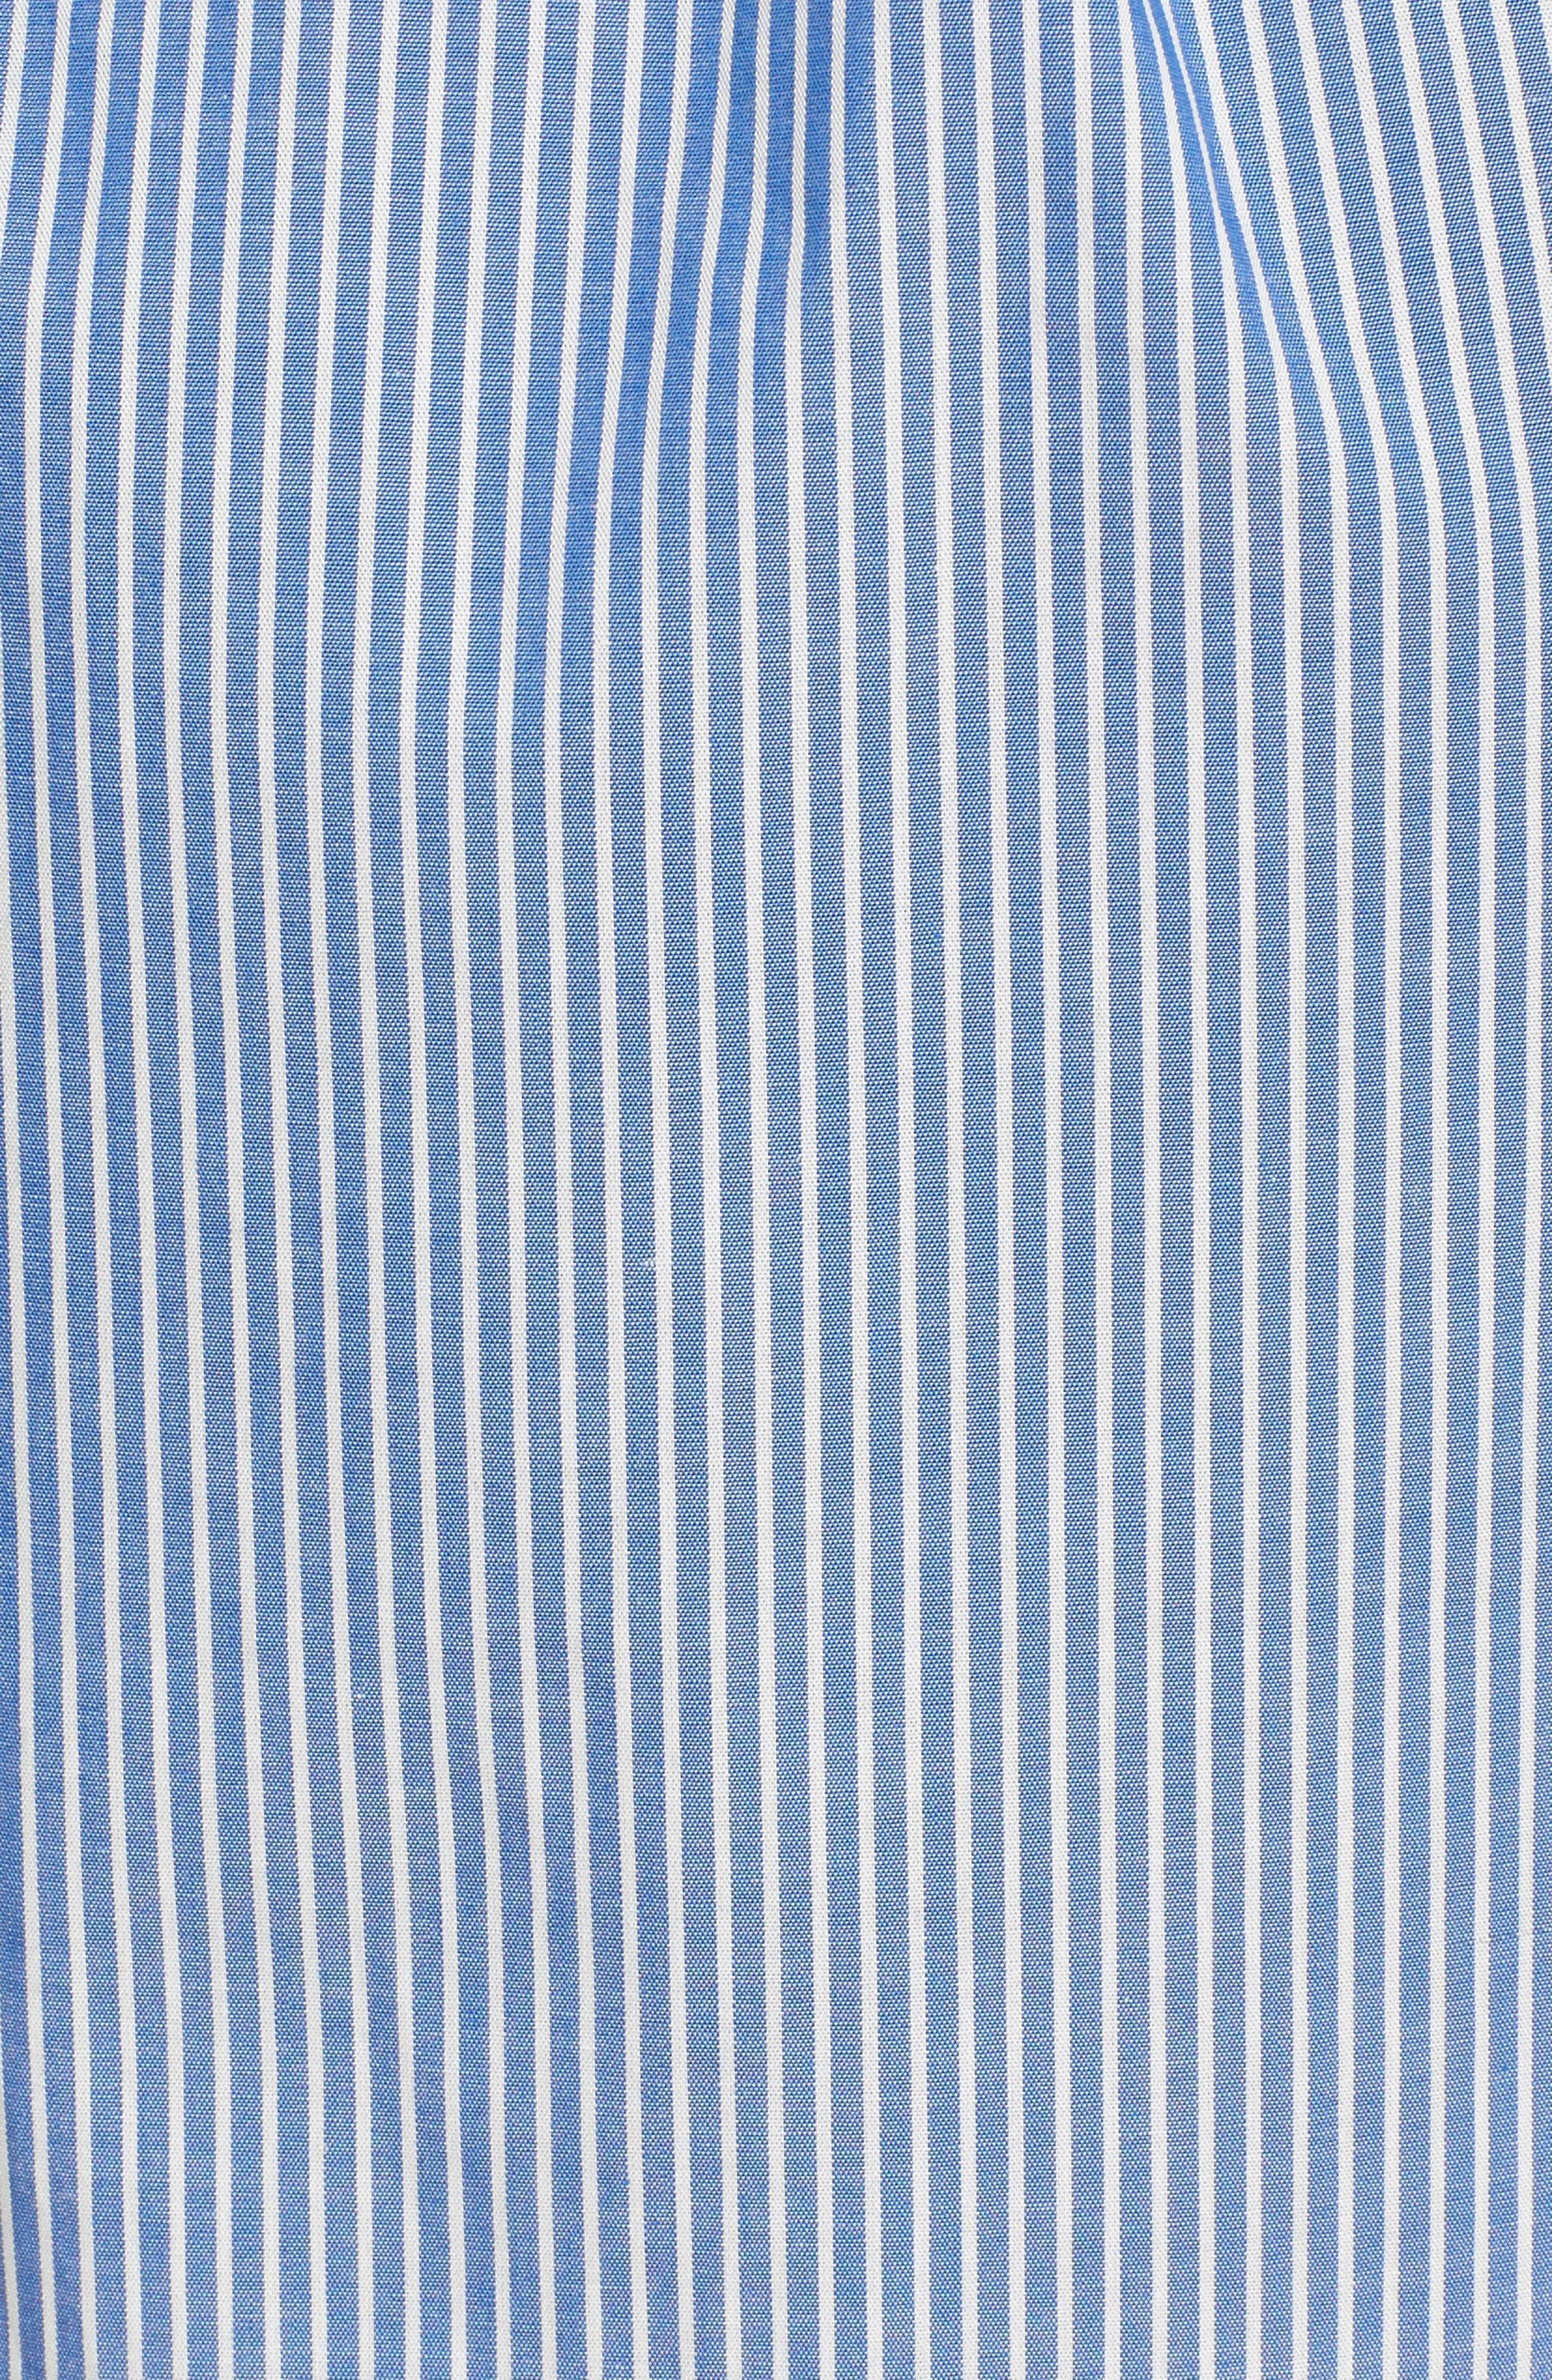 Cotton Poplin Wrap Dress,                             Alternate thumbnail 10, color,